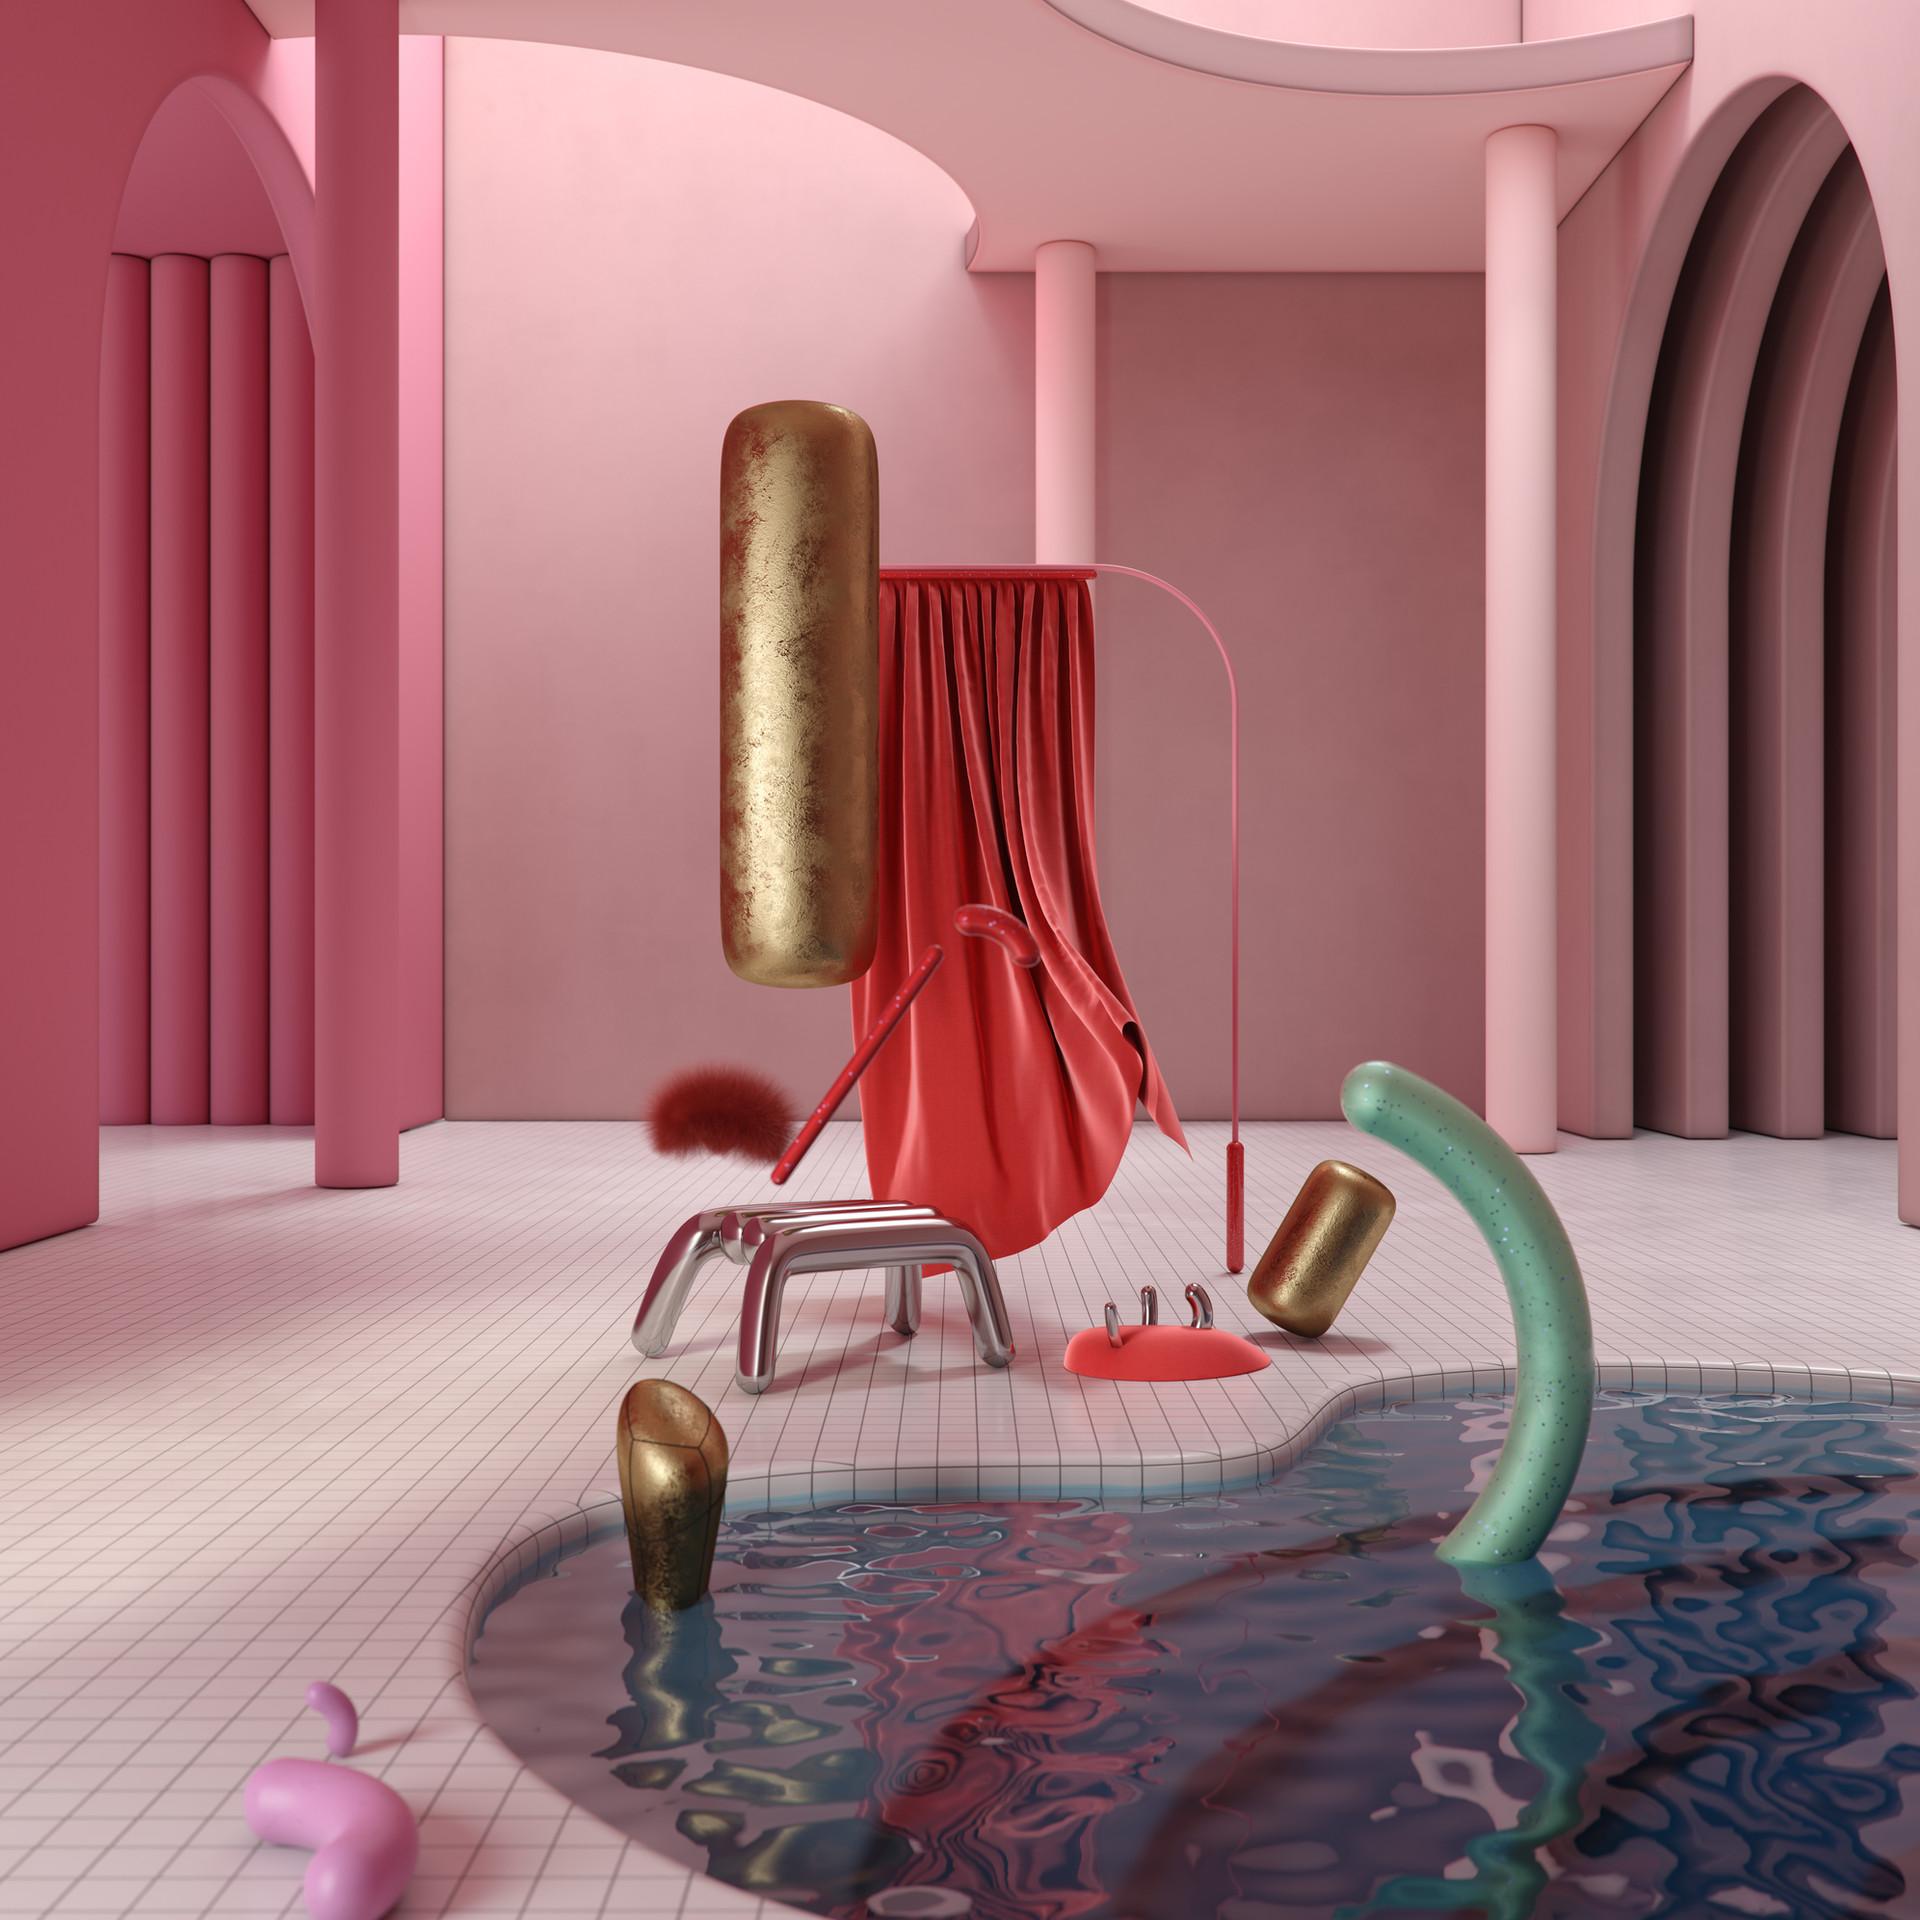 Pool Series I